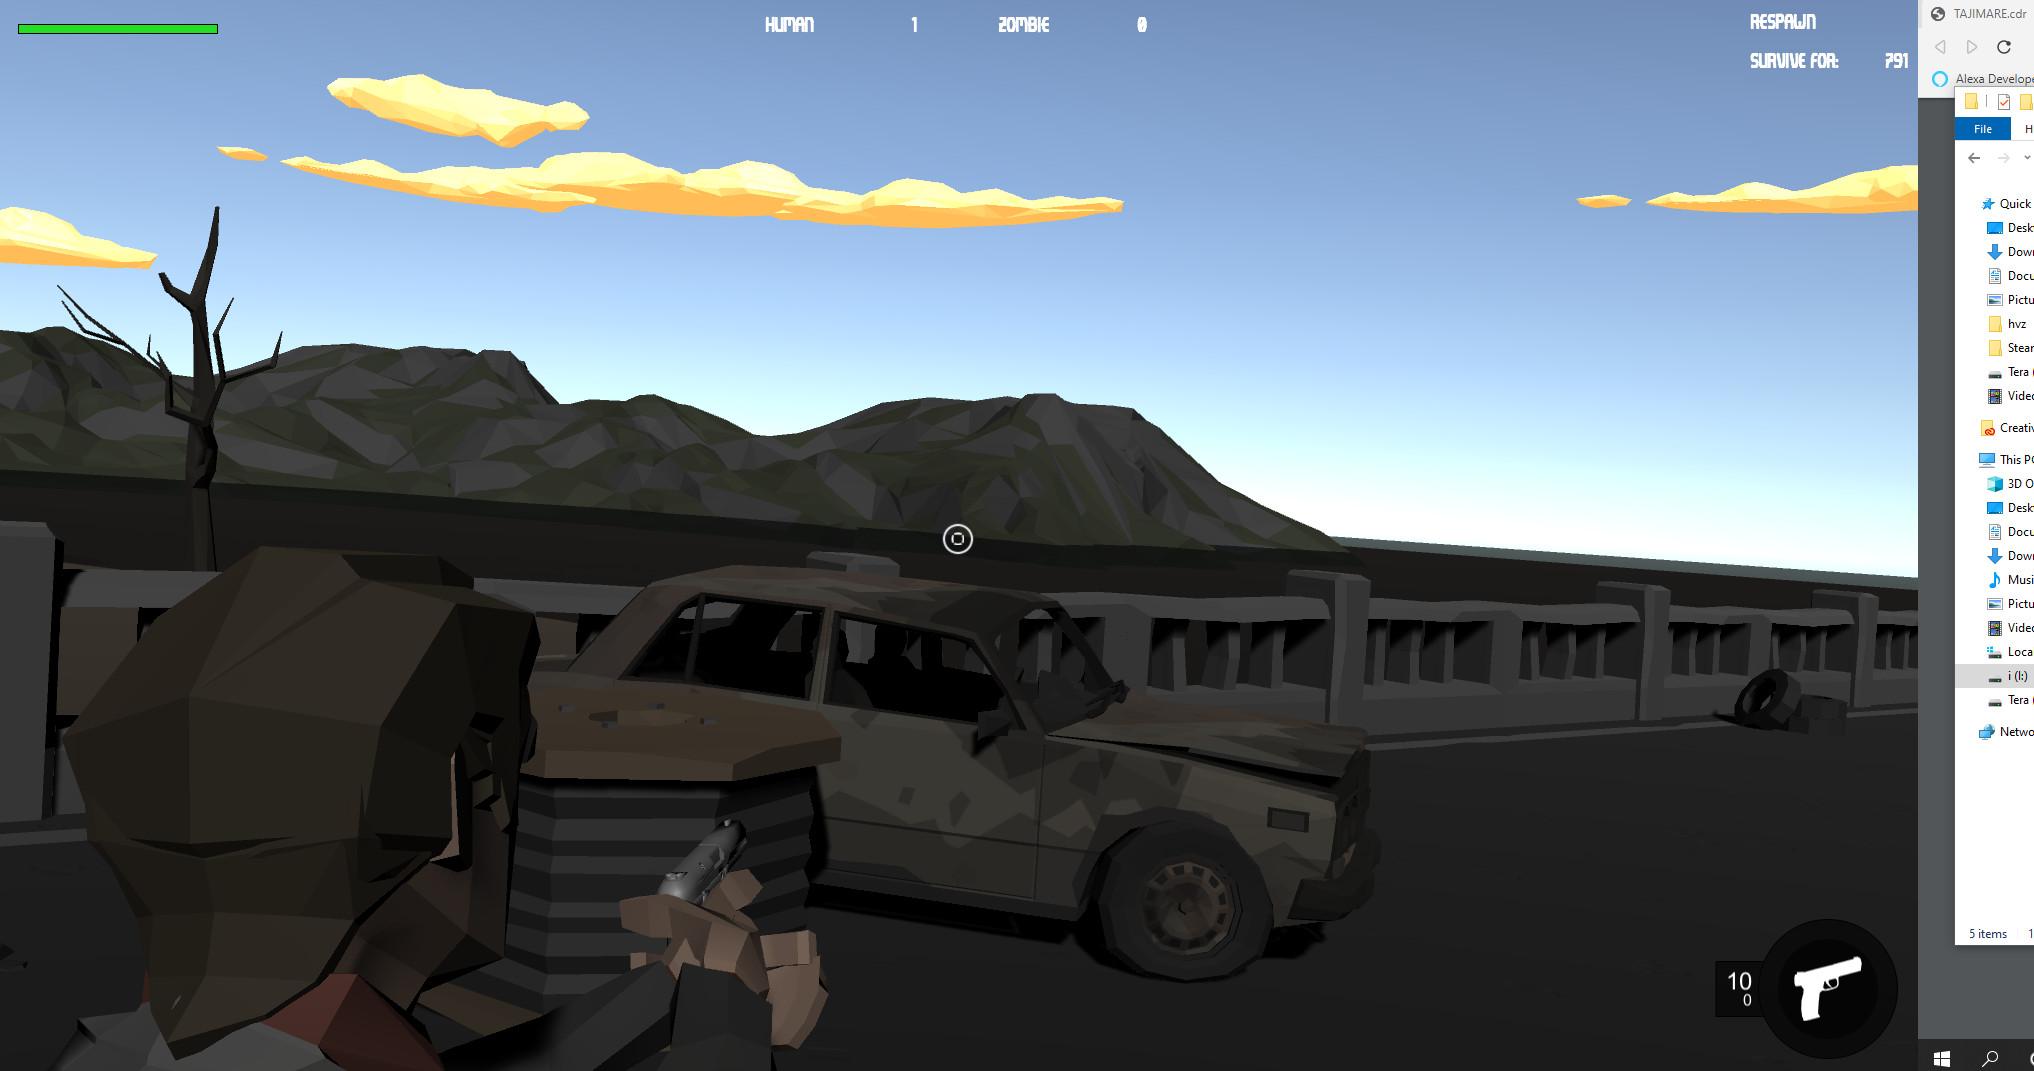 Humans V Zombies screenshot